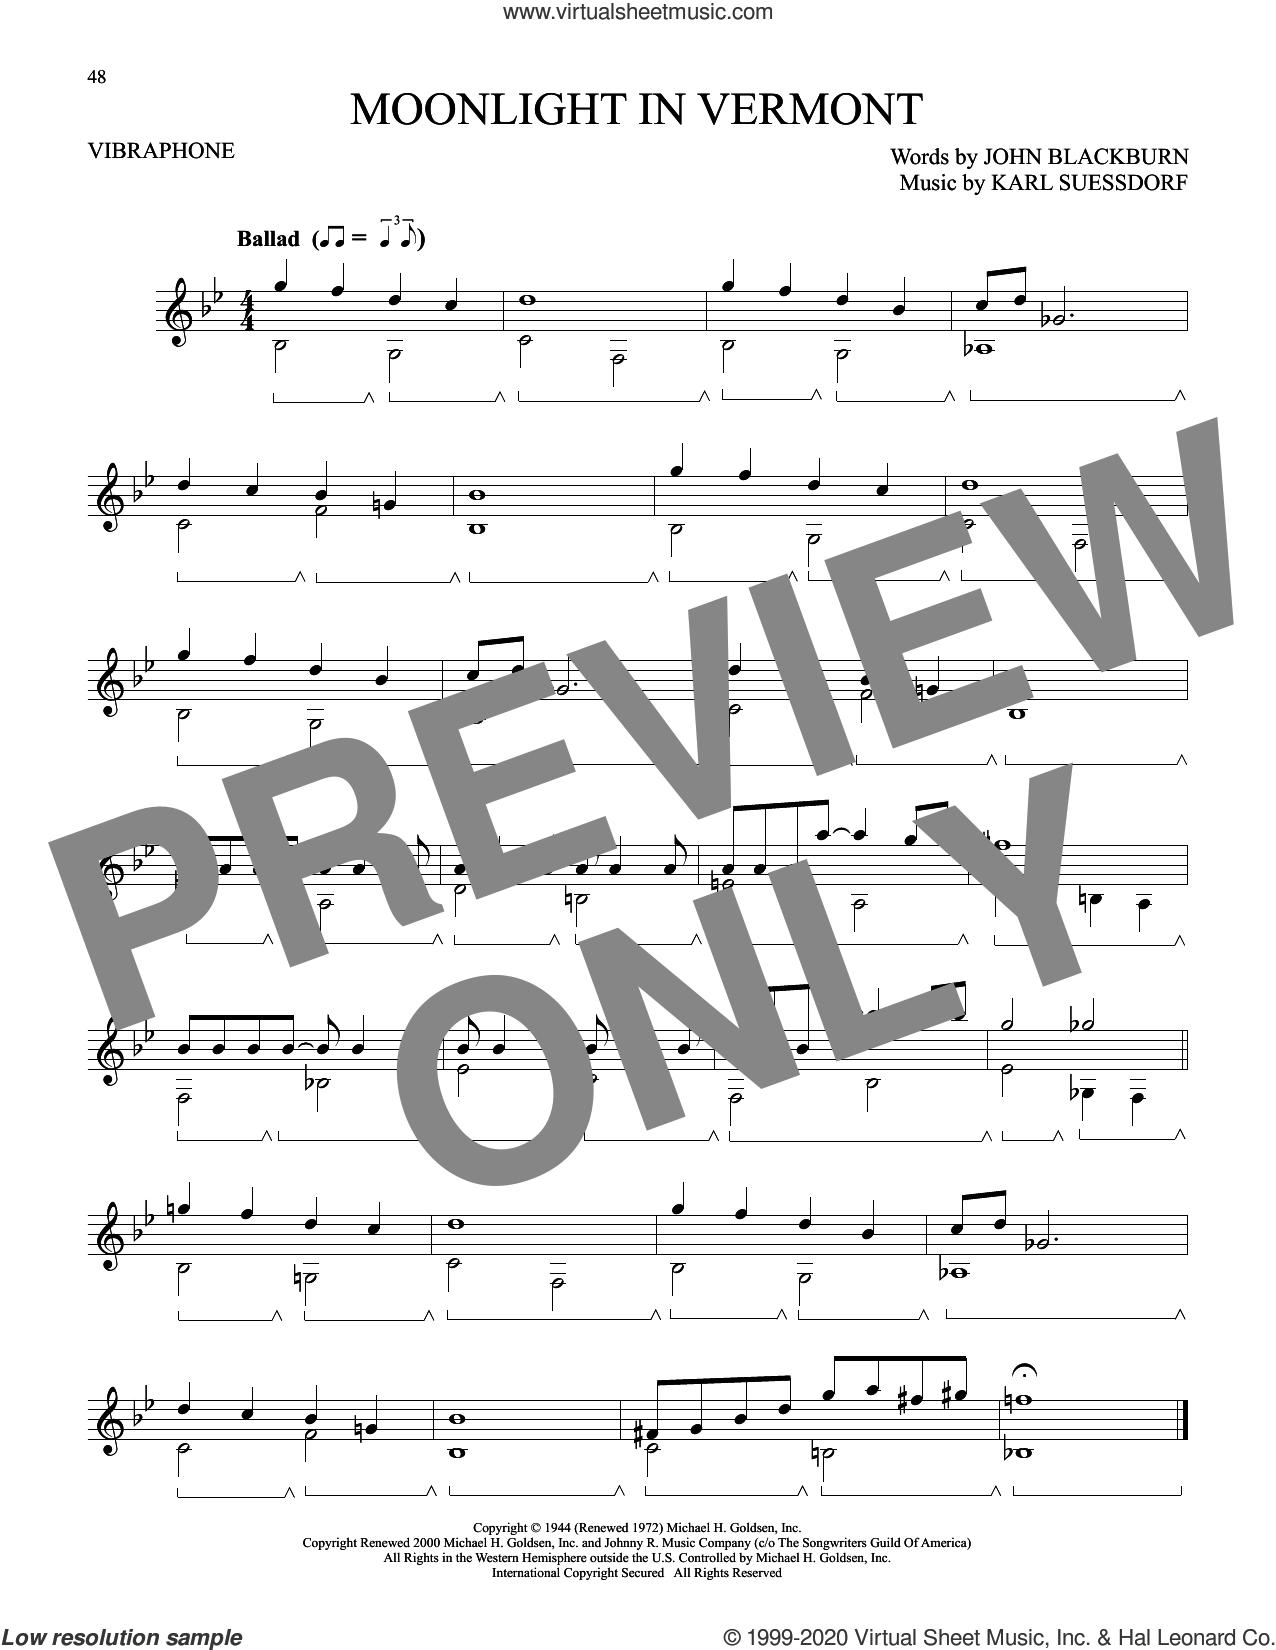 Moonlight In Vermont sheet music for Vibraphone Solo by Karl Suessdorf, John Blackburn and John Blackburn and Karl Suessdorf, intermediate skill level